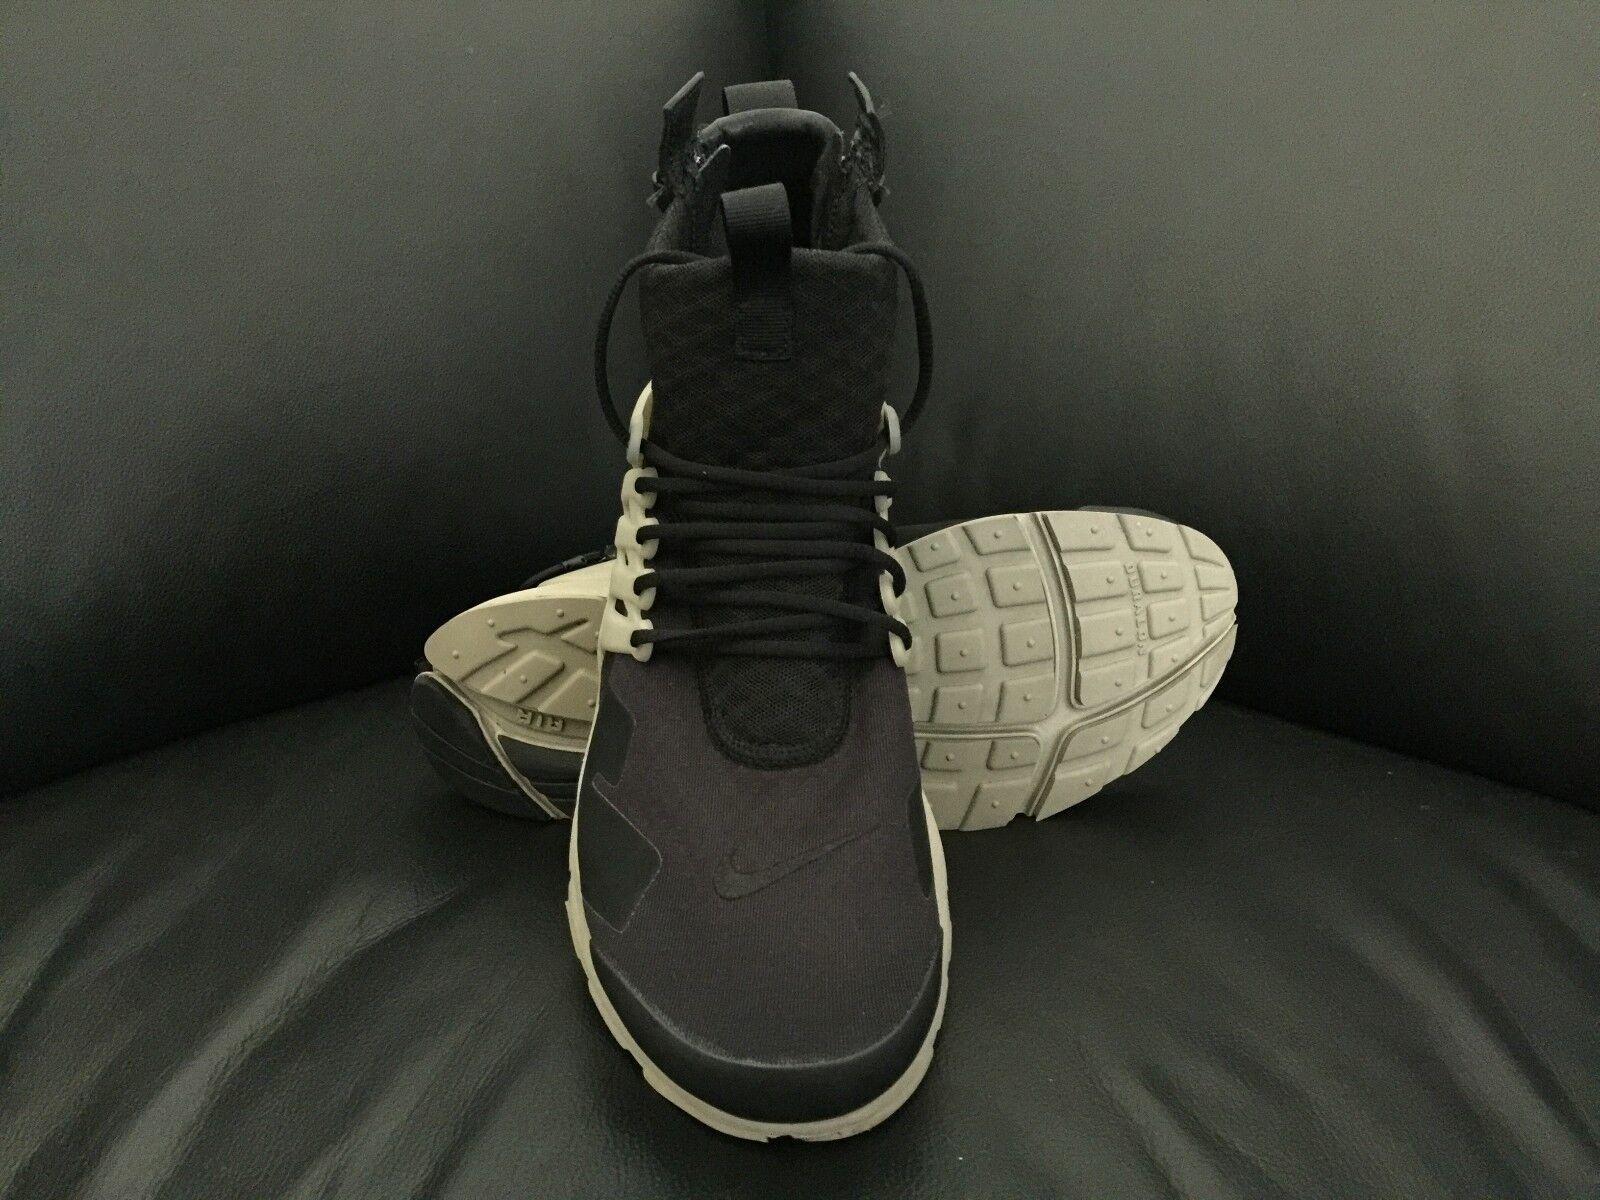 Nike X Acronym Presto Mid 1.0, Bamboo, (844672-001), Medium